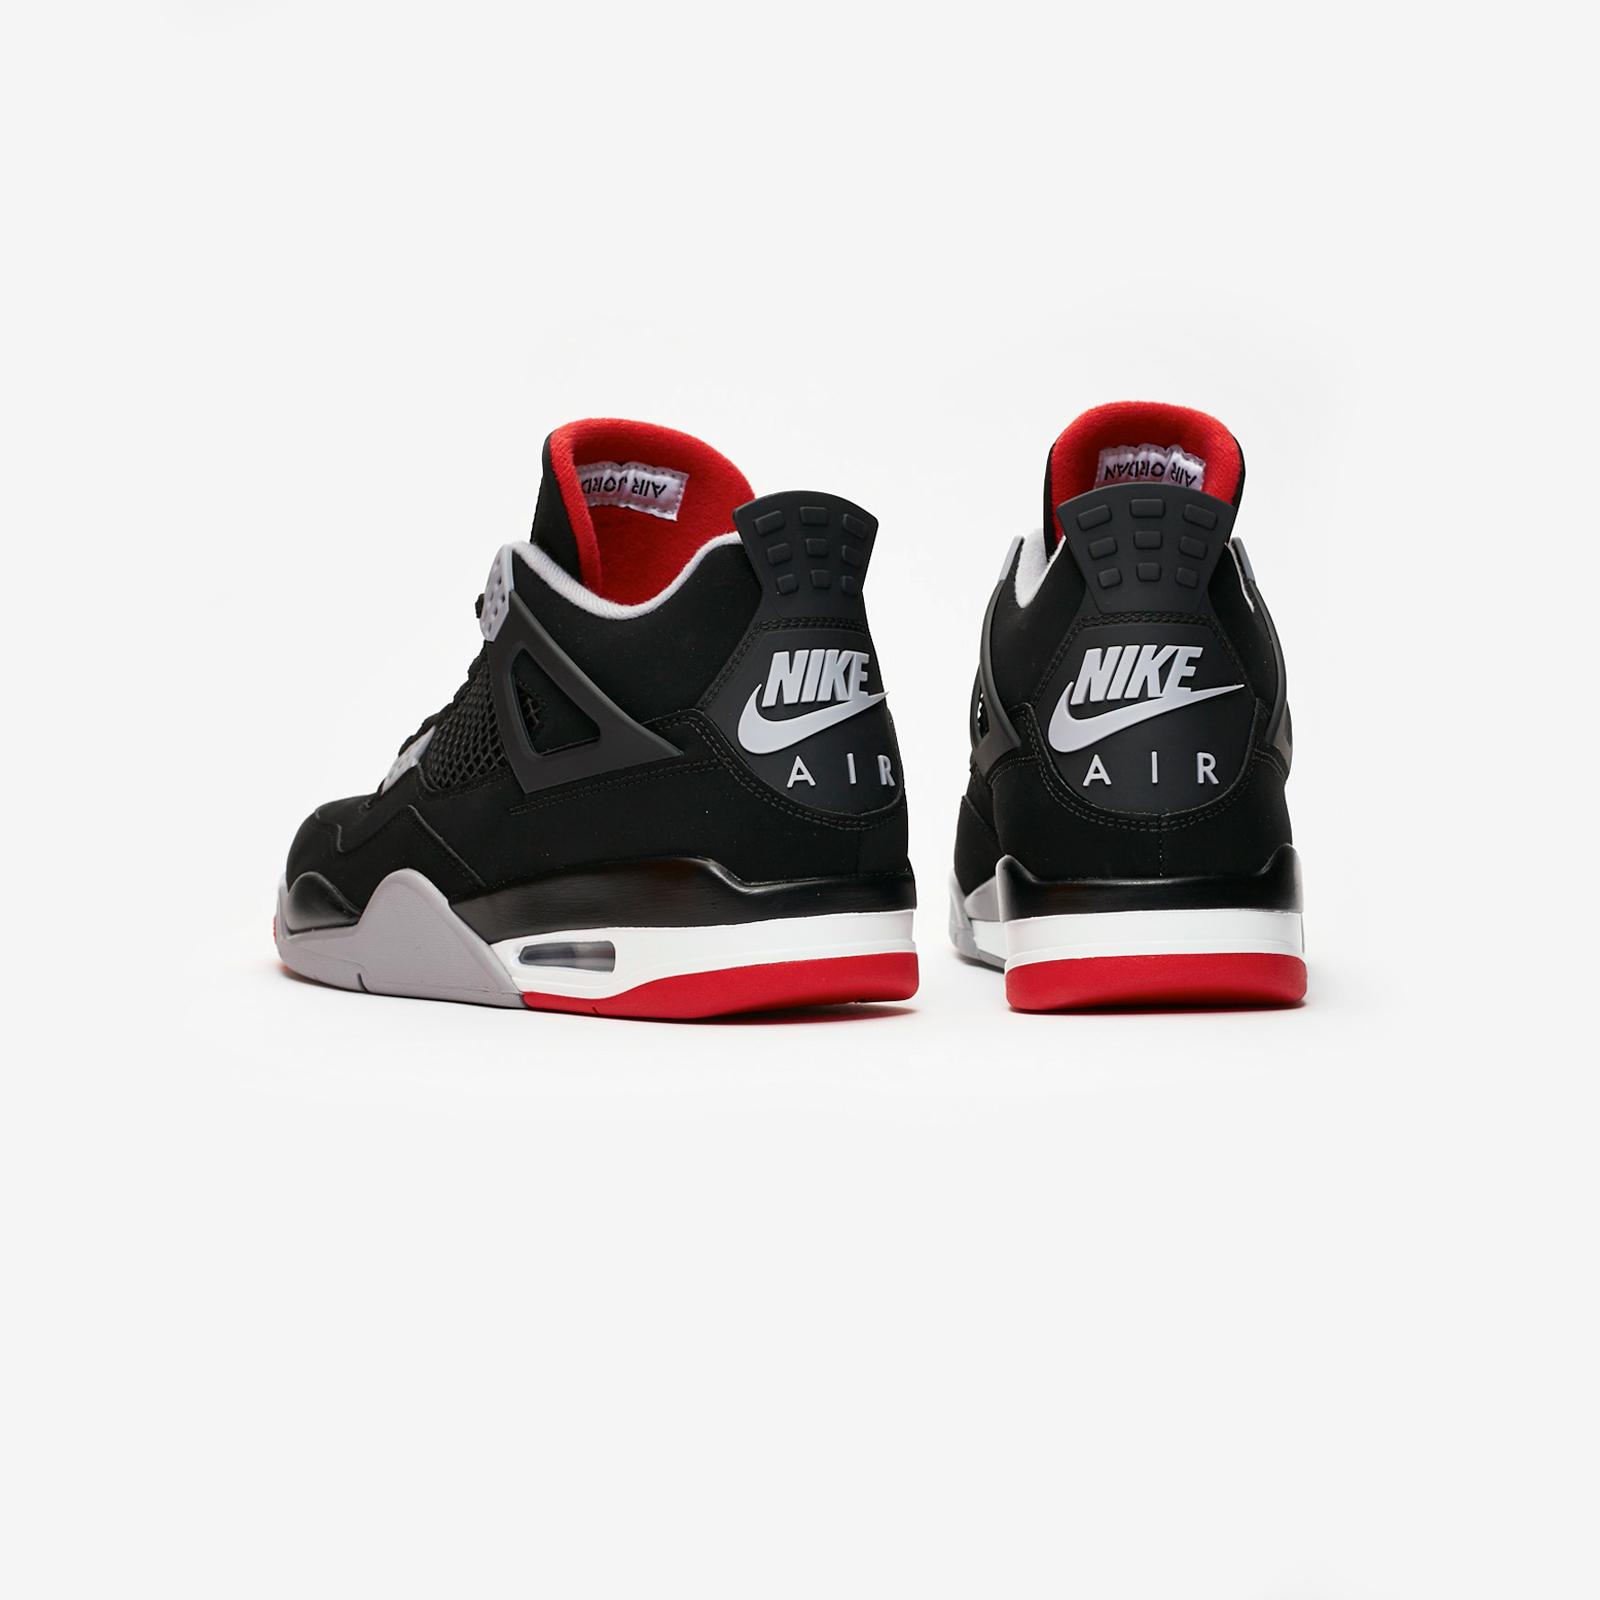 0b82050da21569 Jordan Brand Air Jordan 4 Retro - 308497-060 - Sneakersnstuff ...